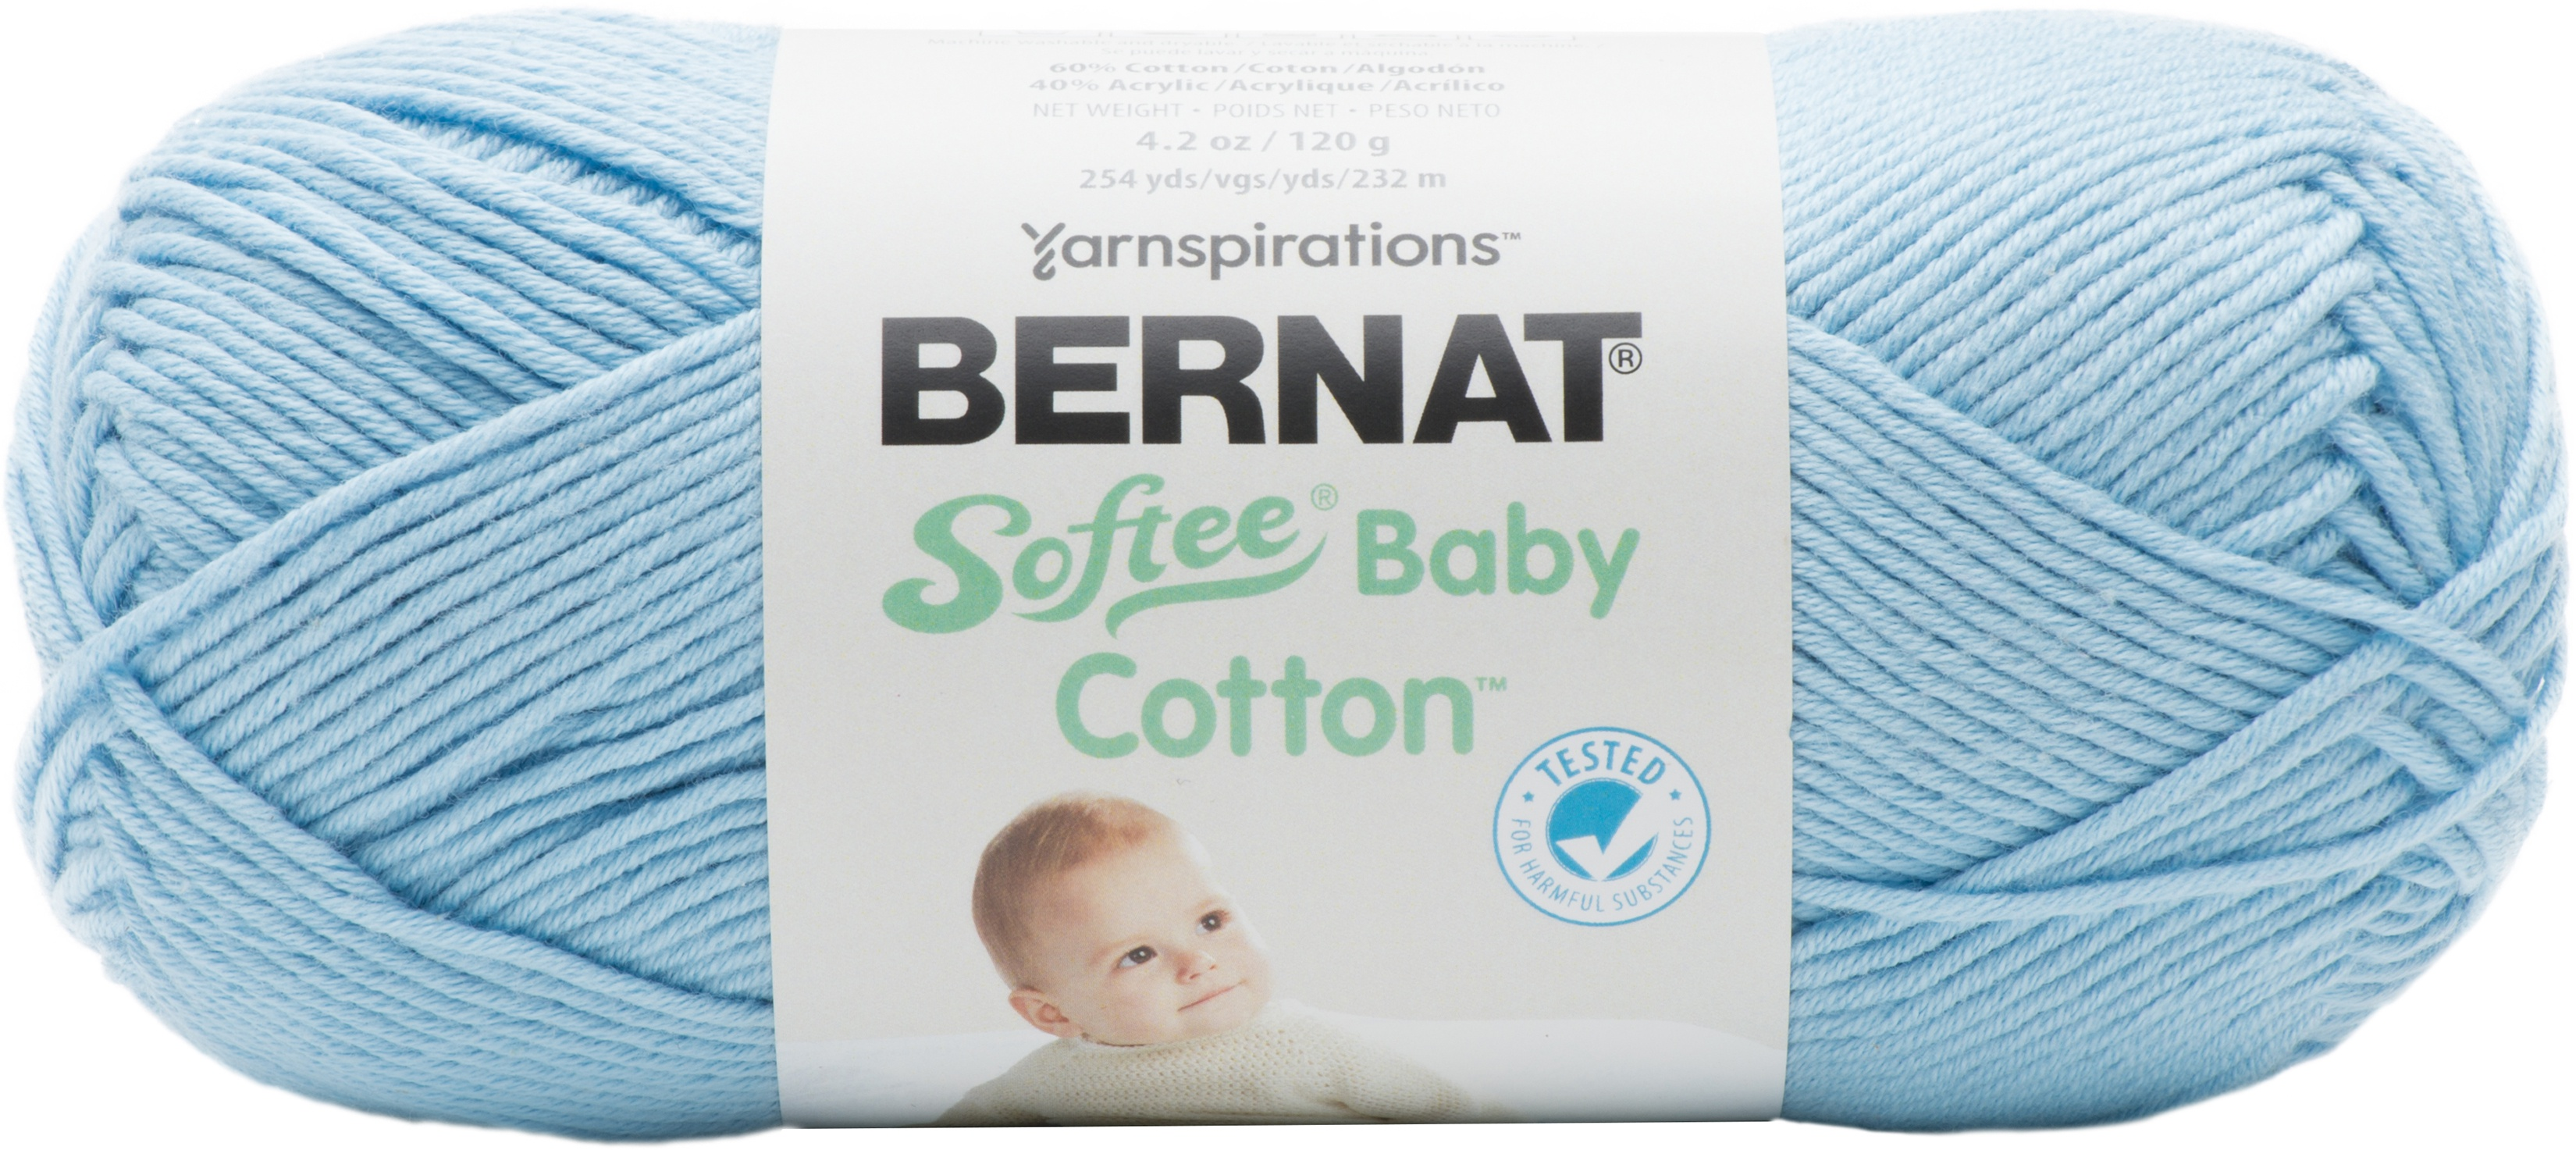 Bernat Softee Baby Cotton Yarn - 18 COLORS